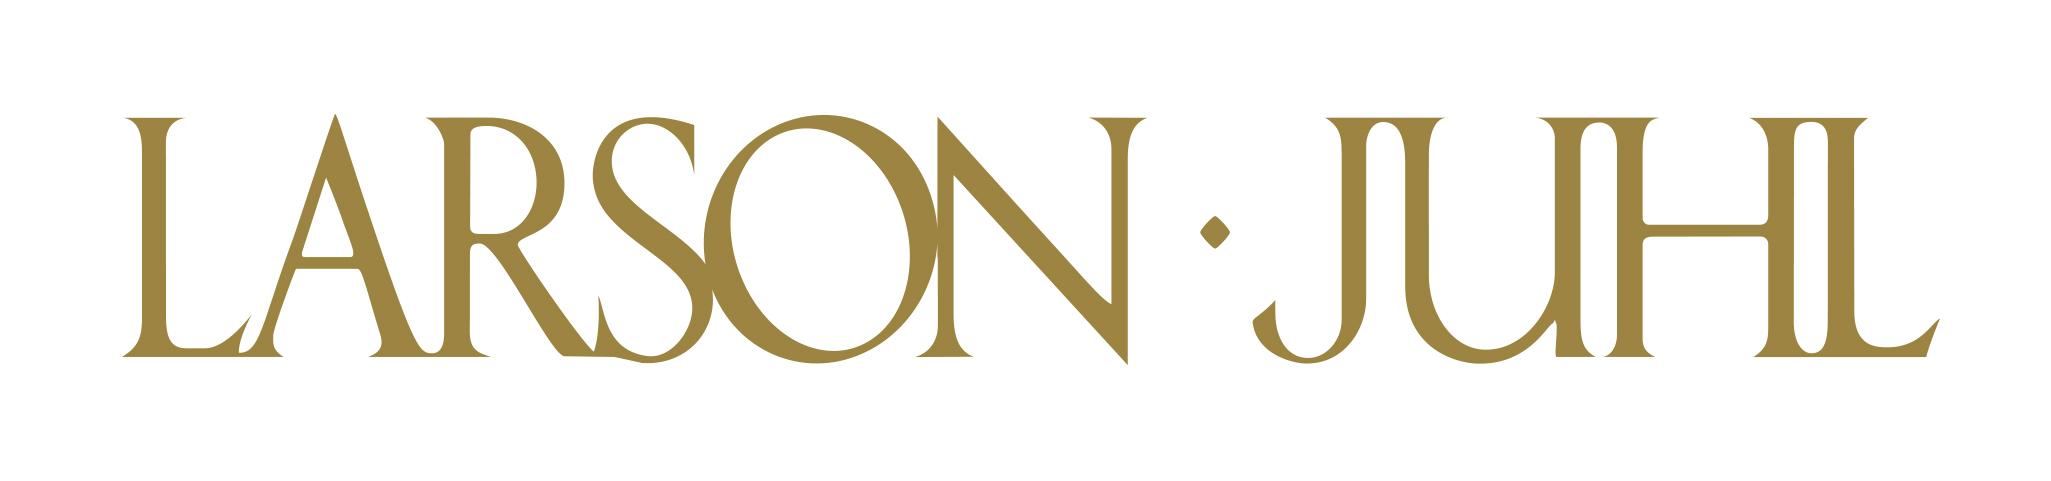 Larson-Juhl logo